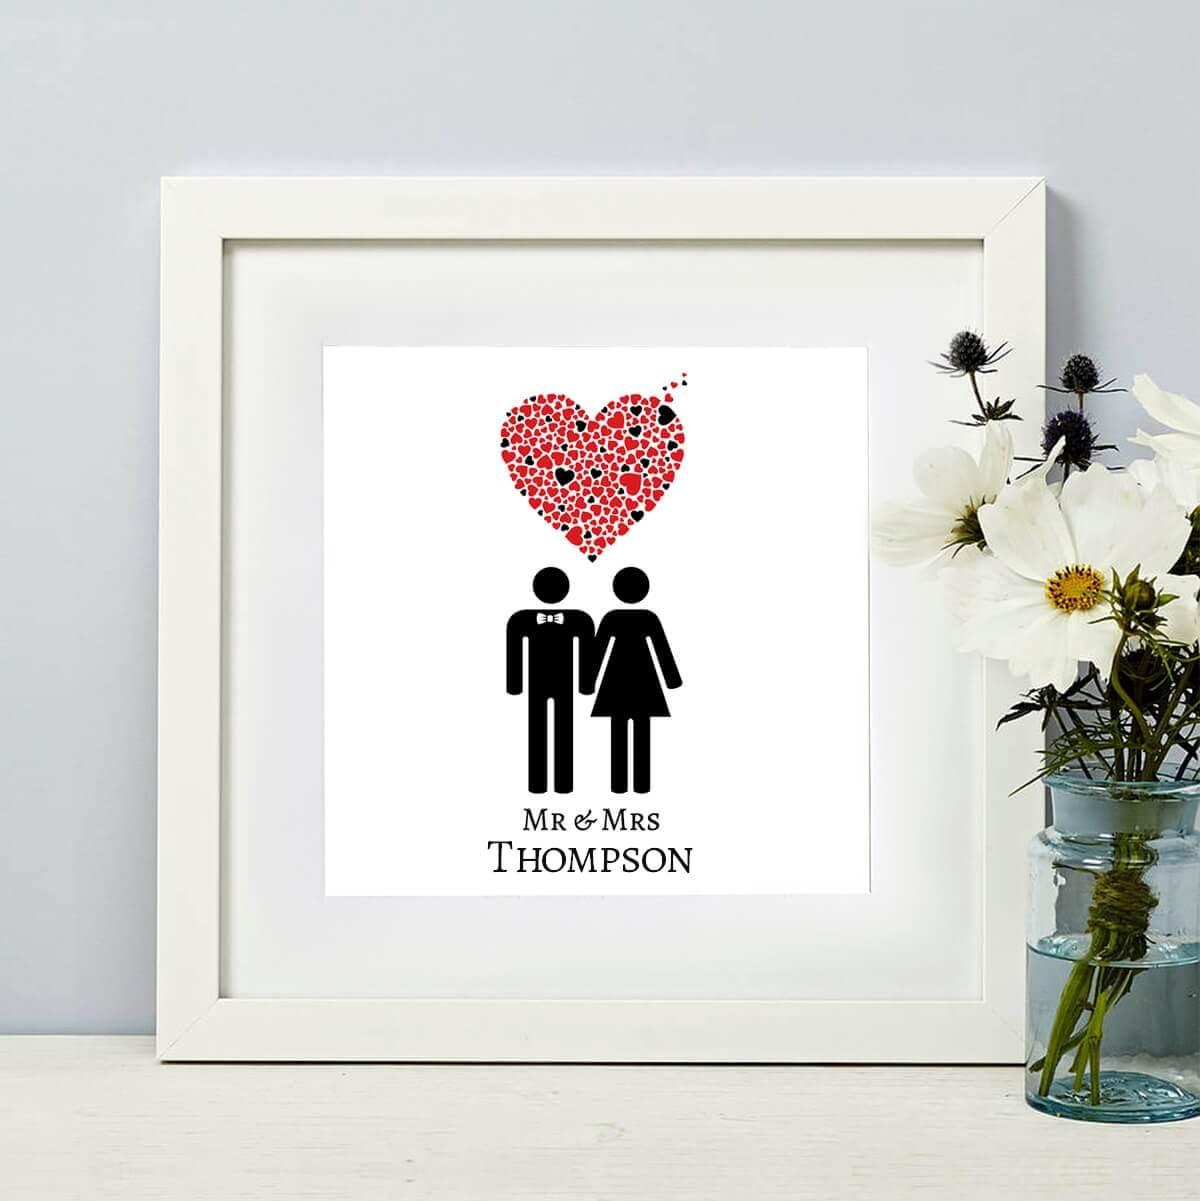 Personalised Mr & Mrs Heart Wall Art